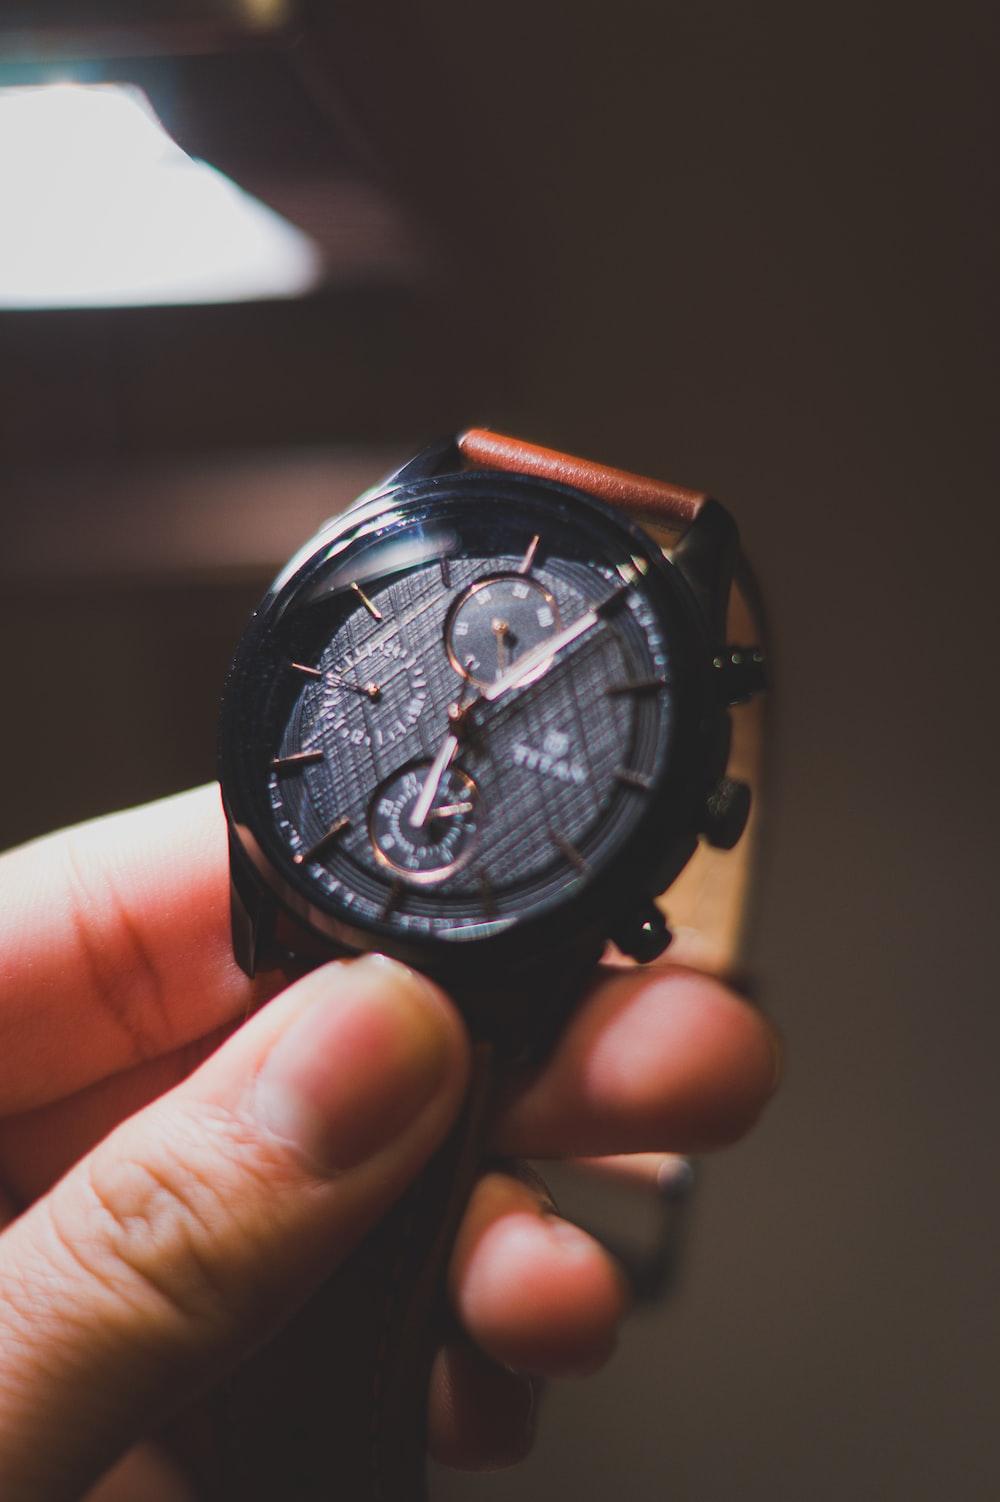 black and orange chronograph watch